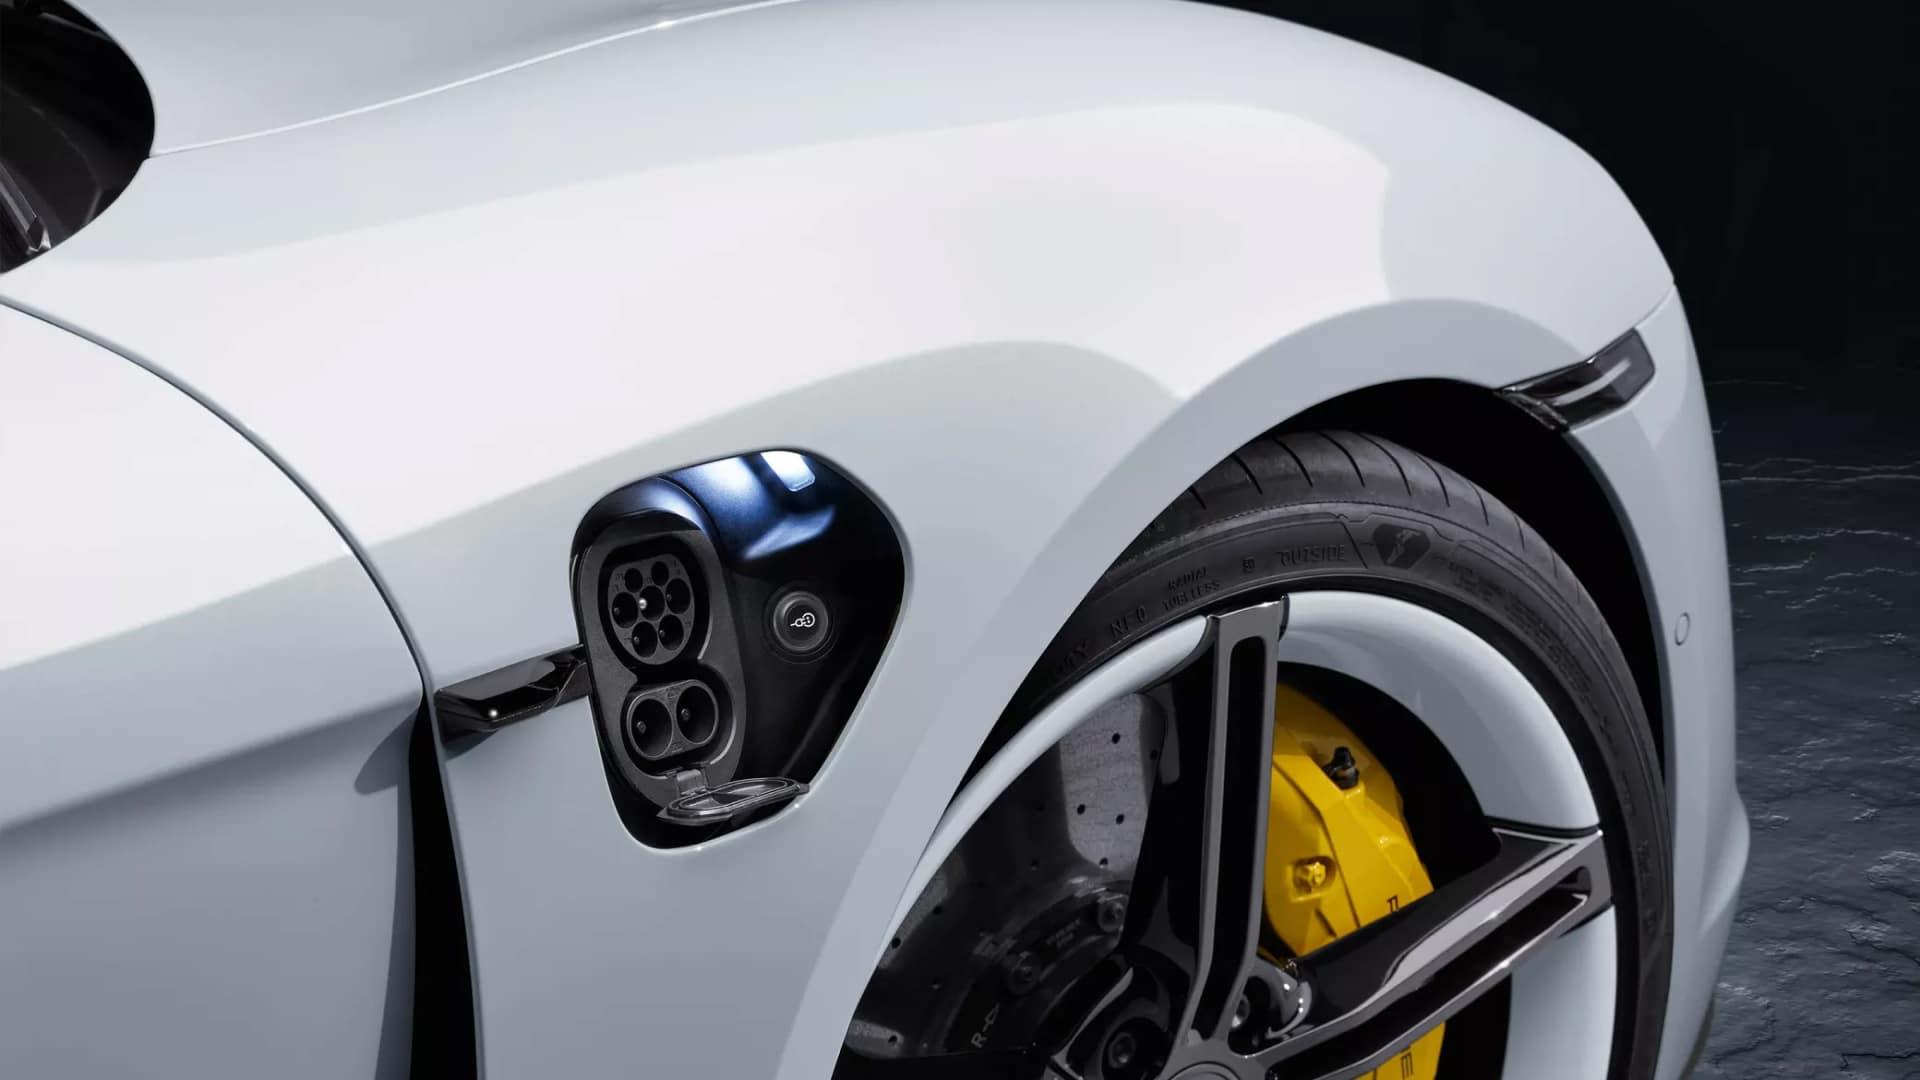 2020 Porsche Taycan Exterior